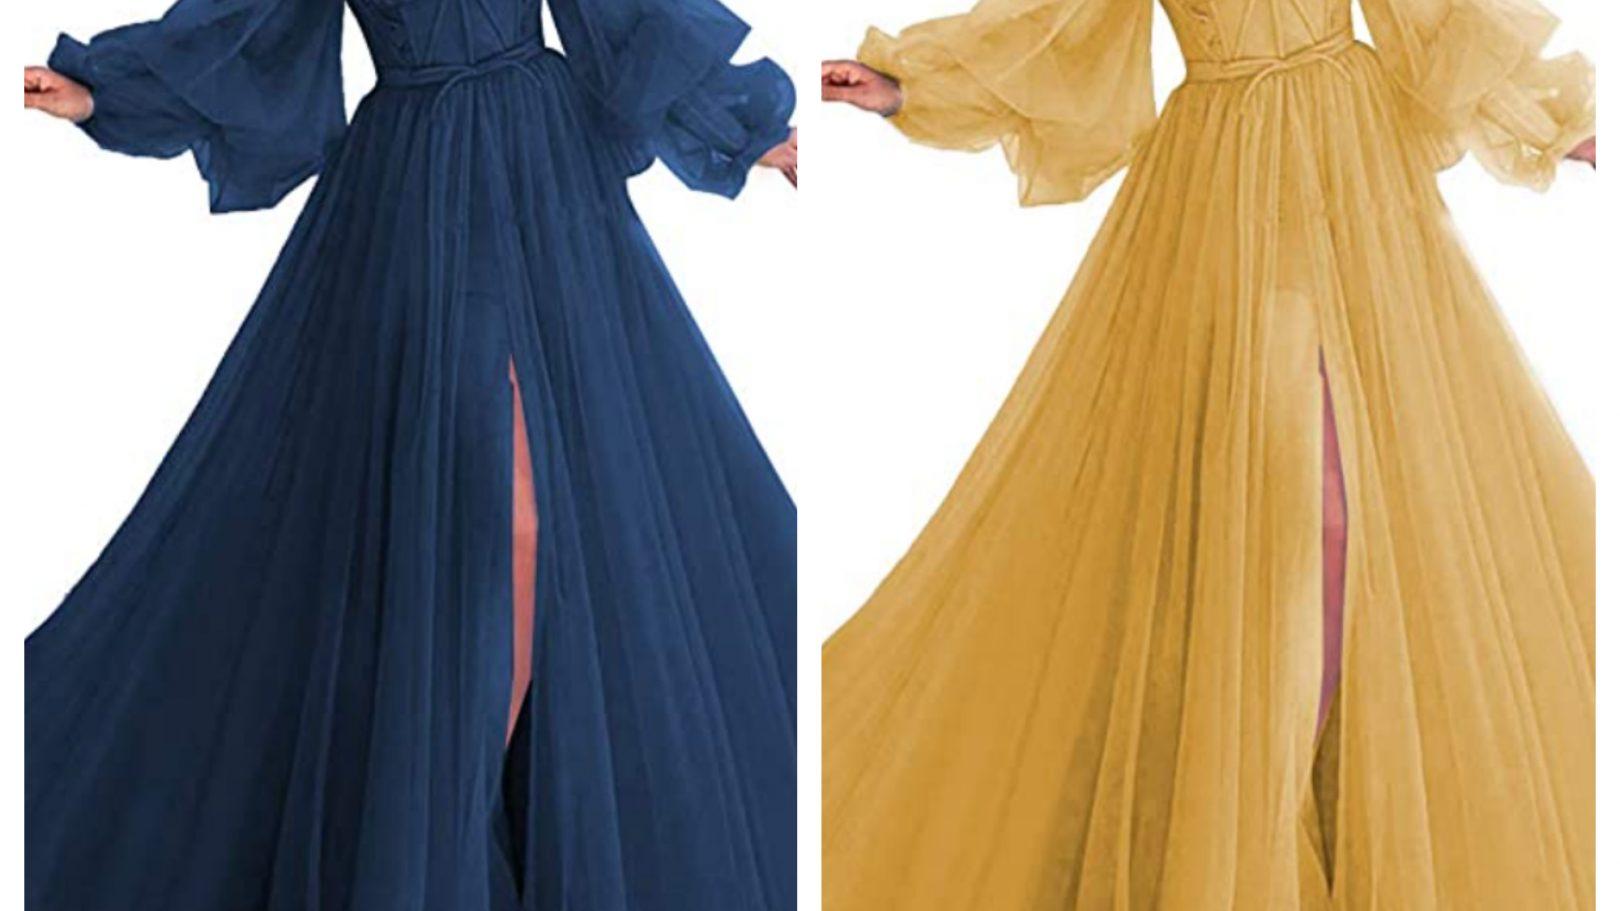 TikTok Bridgerton ball gown